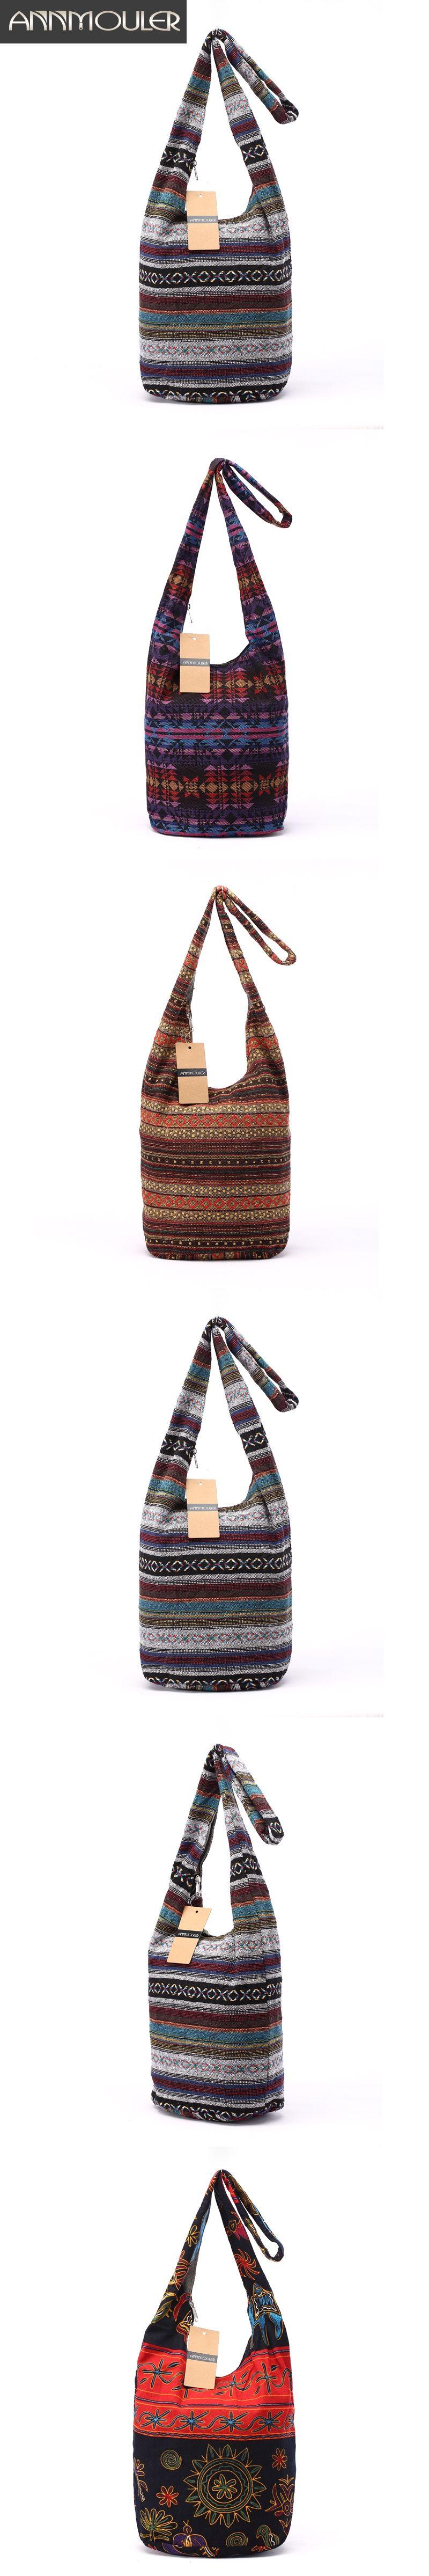 e1ea0d128221 Women Vintage Shoulder Bag Mochila Retro Weave Fabric Messenger Bag  Bohemian Style Hippie Aztec Folk Tribal Crossbody Bag